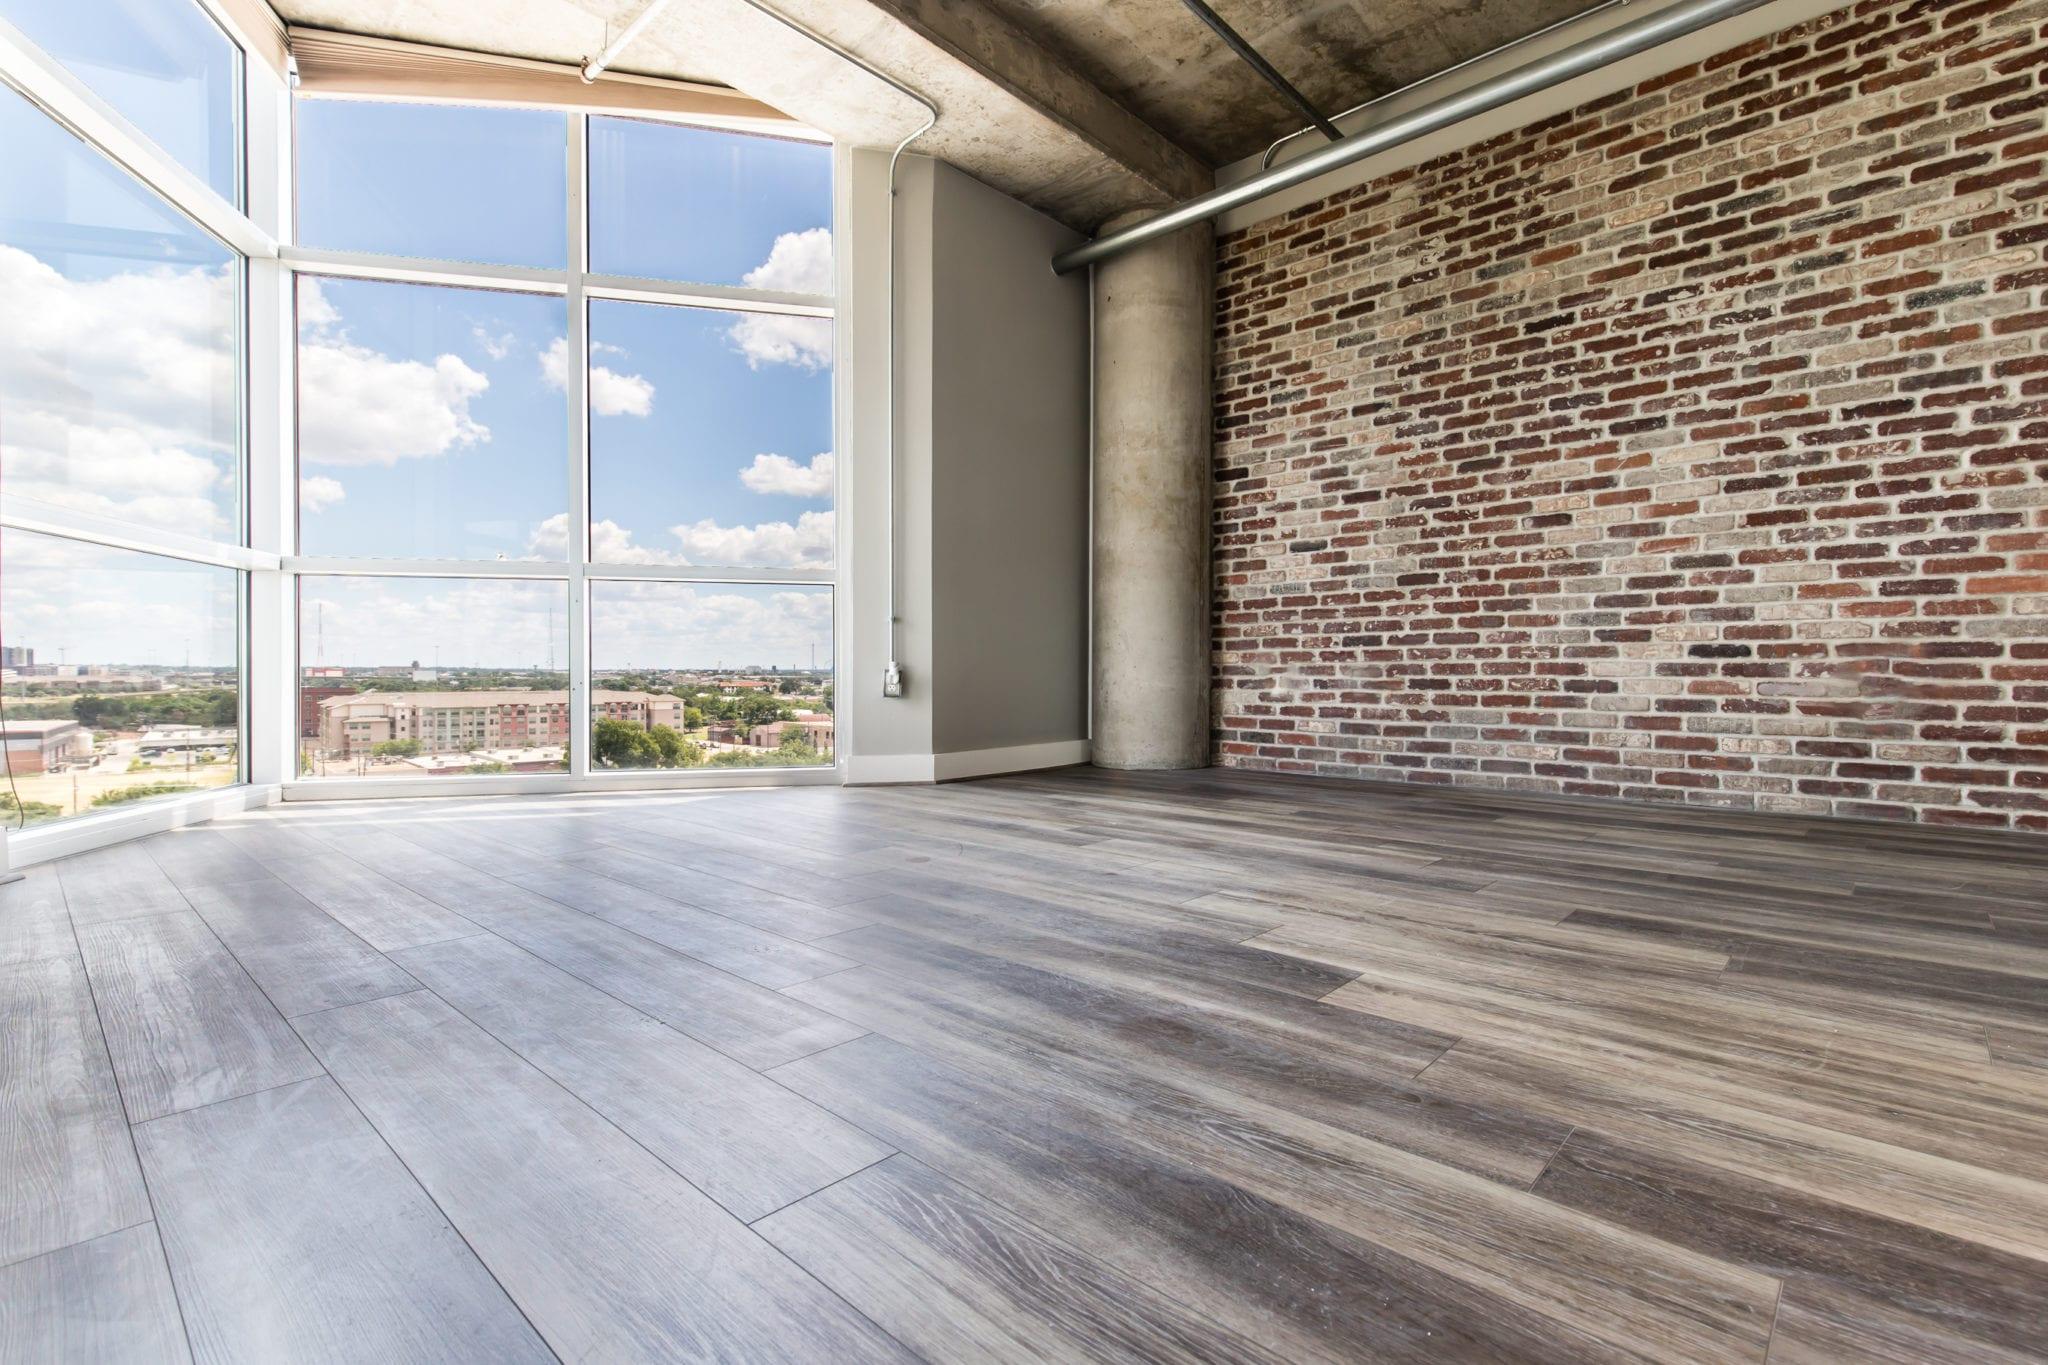 Mid-Rise-Dallas-Condo-Living-Room-Floor-After-Remodeling-Dallas-TX-75215